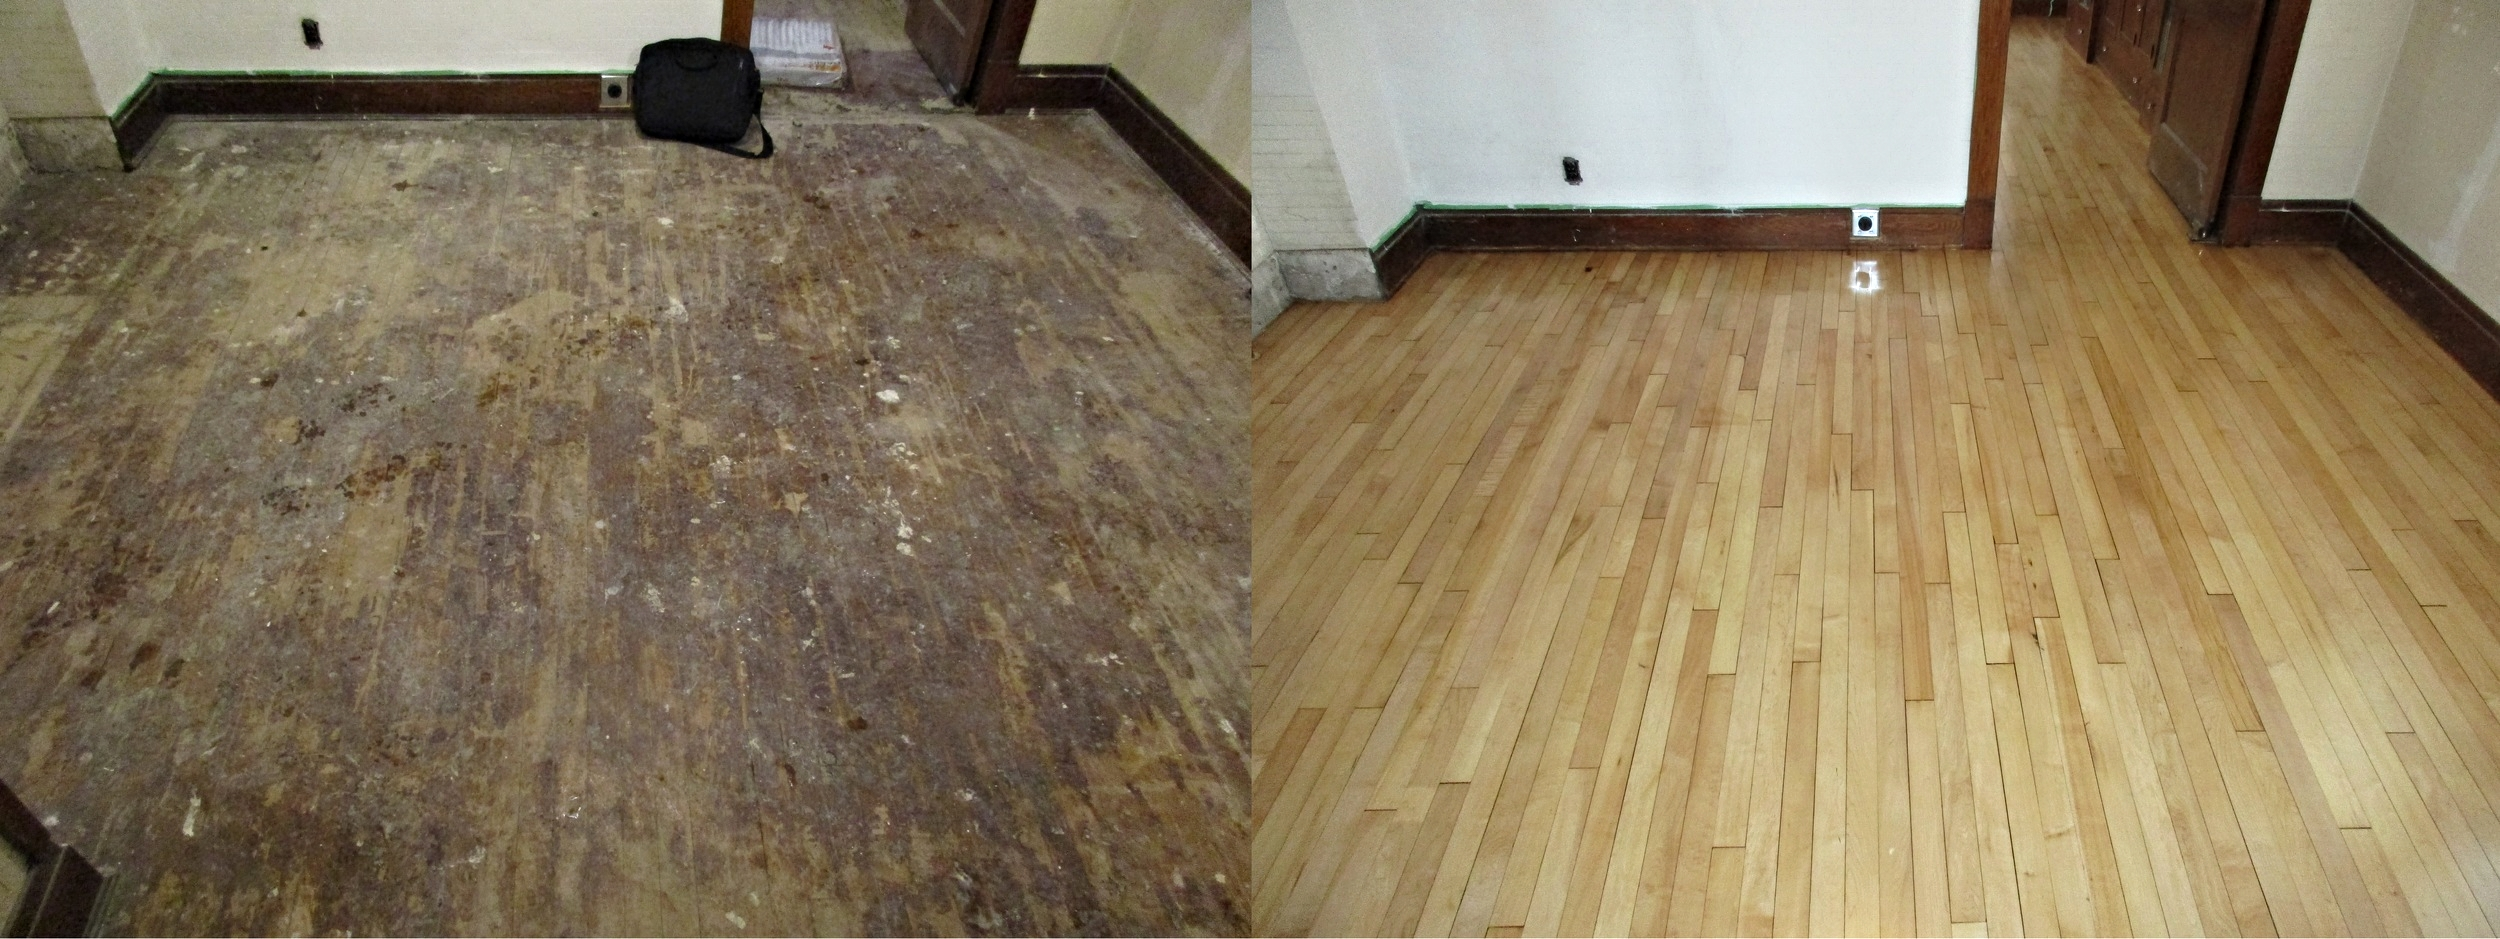 Wood Floor Refinishing Sand Stain Raven Hardwood Flooring